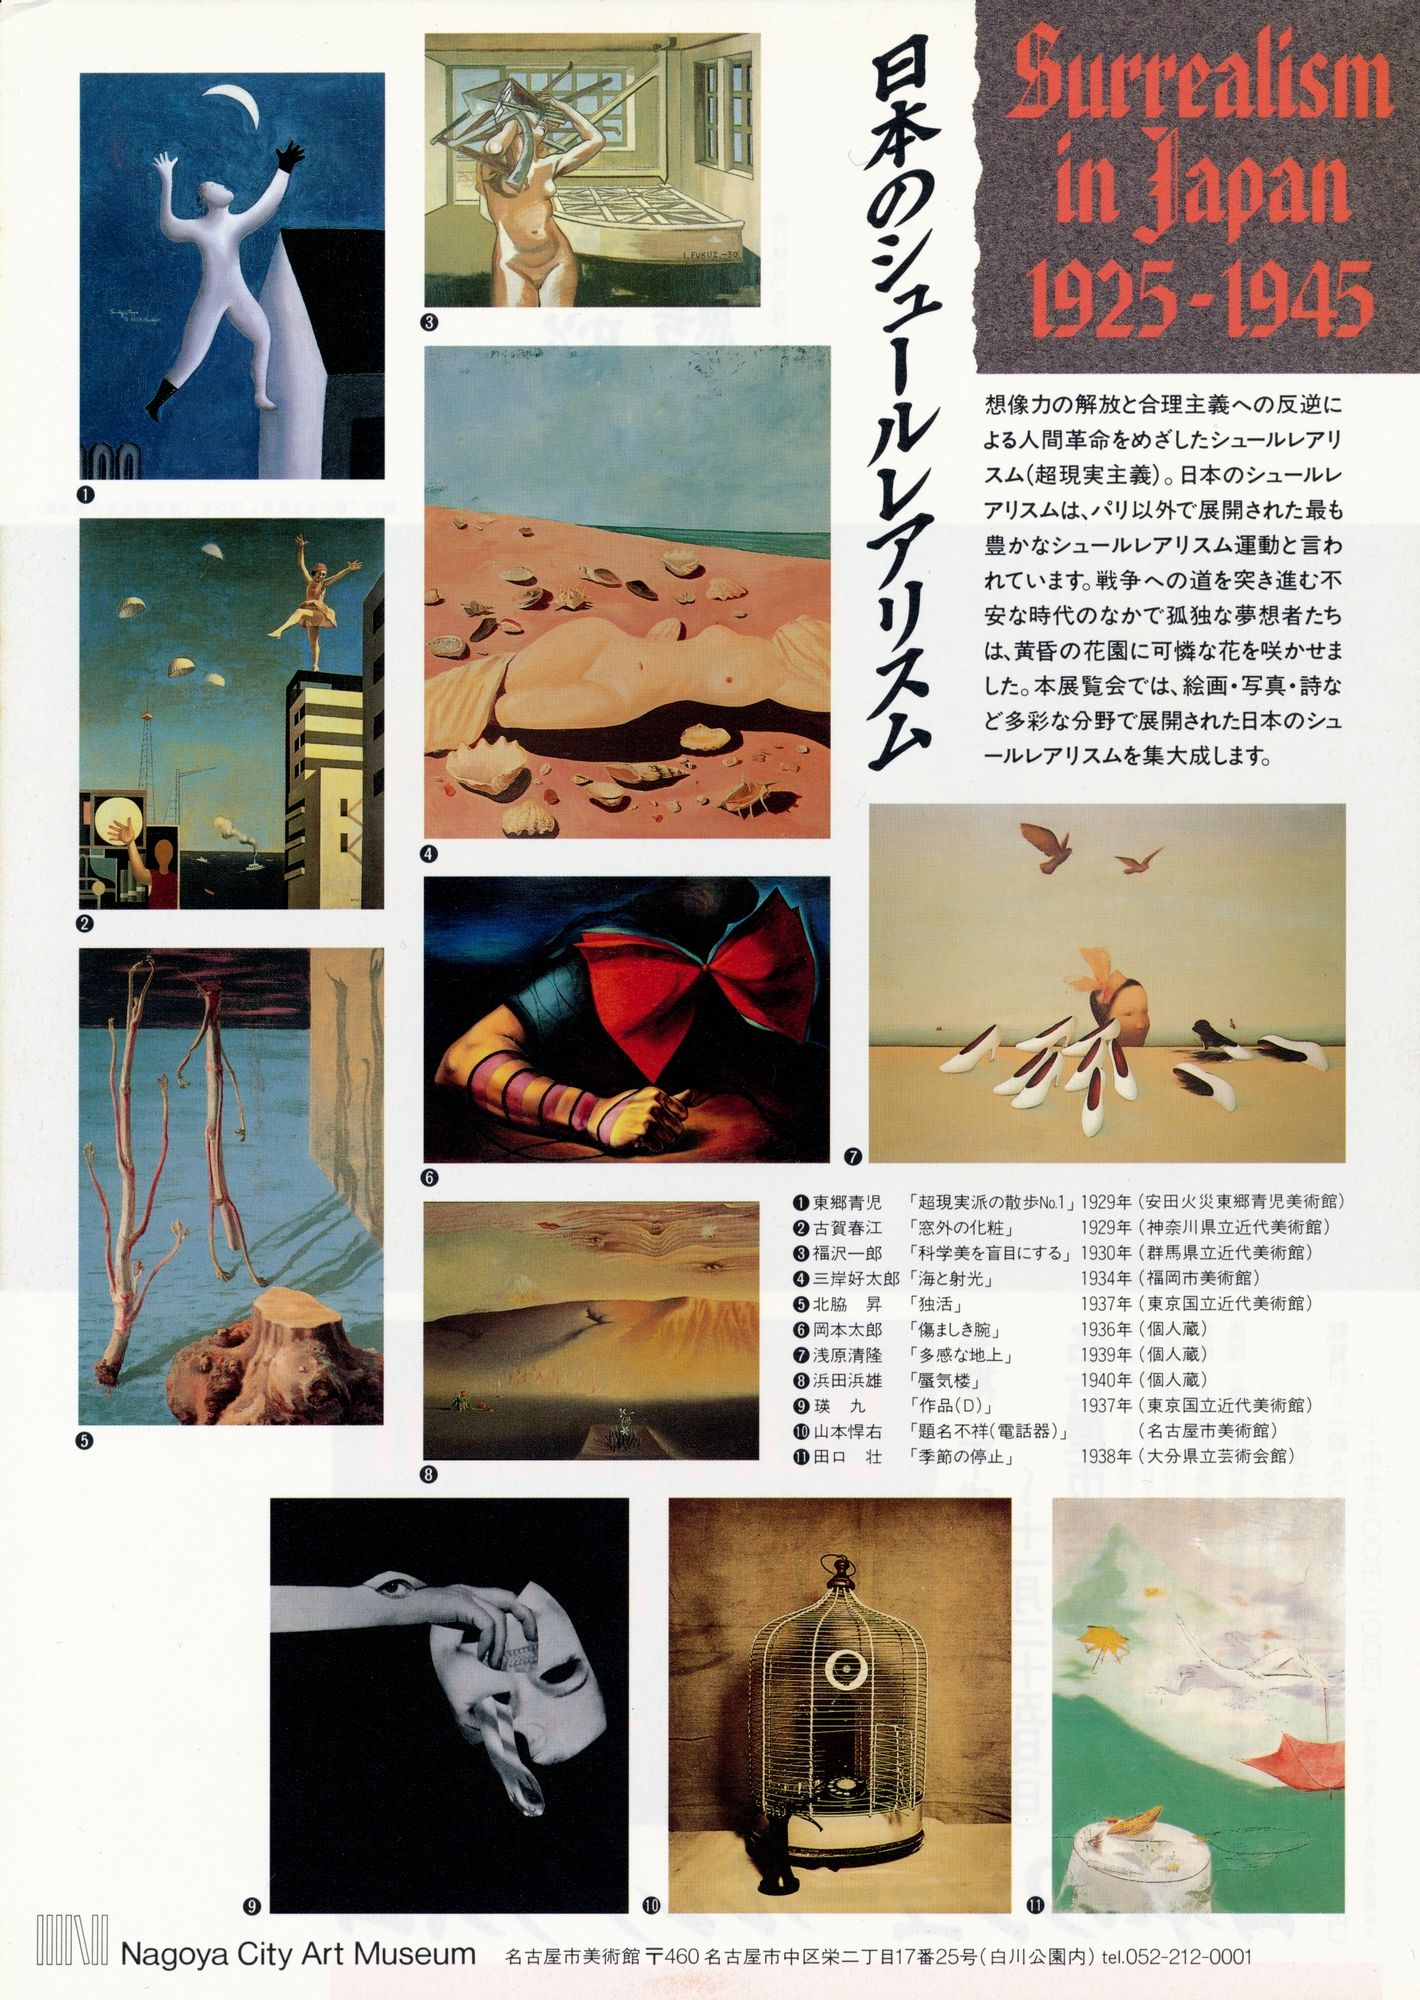 Surrealism in Japan 1925 - 1945, Nagoya City Art Museum 1990. photo on the bottom center / Buddhist Temple's Birdcage by Kansuke Yamamoto 1940.写真下中央;山本悍右 昭和15年